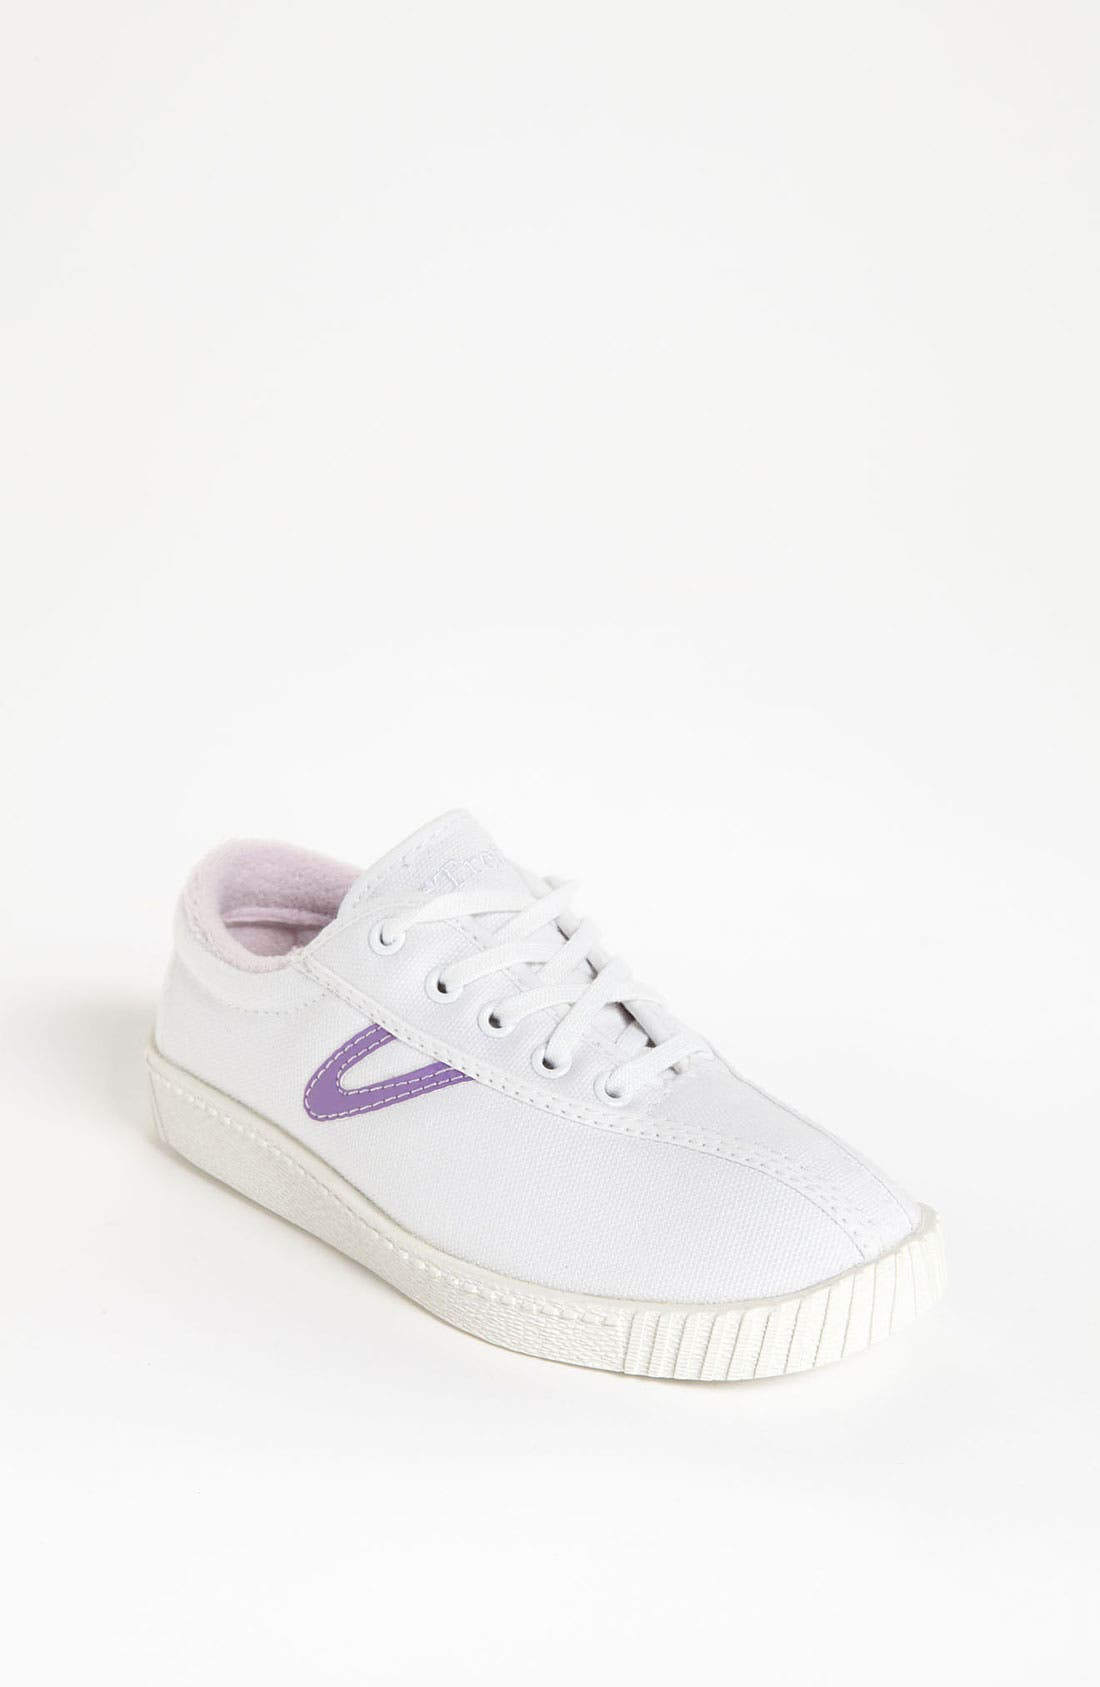 Alternate Image 1 Selected - Tretorn 'Nylite' Tennis Shoe (Toddler, Little Kid & Big Kid)